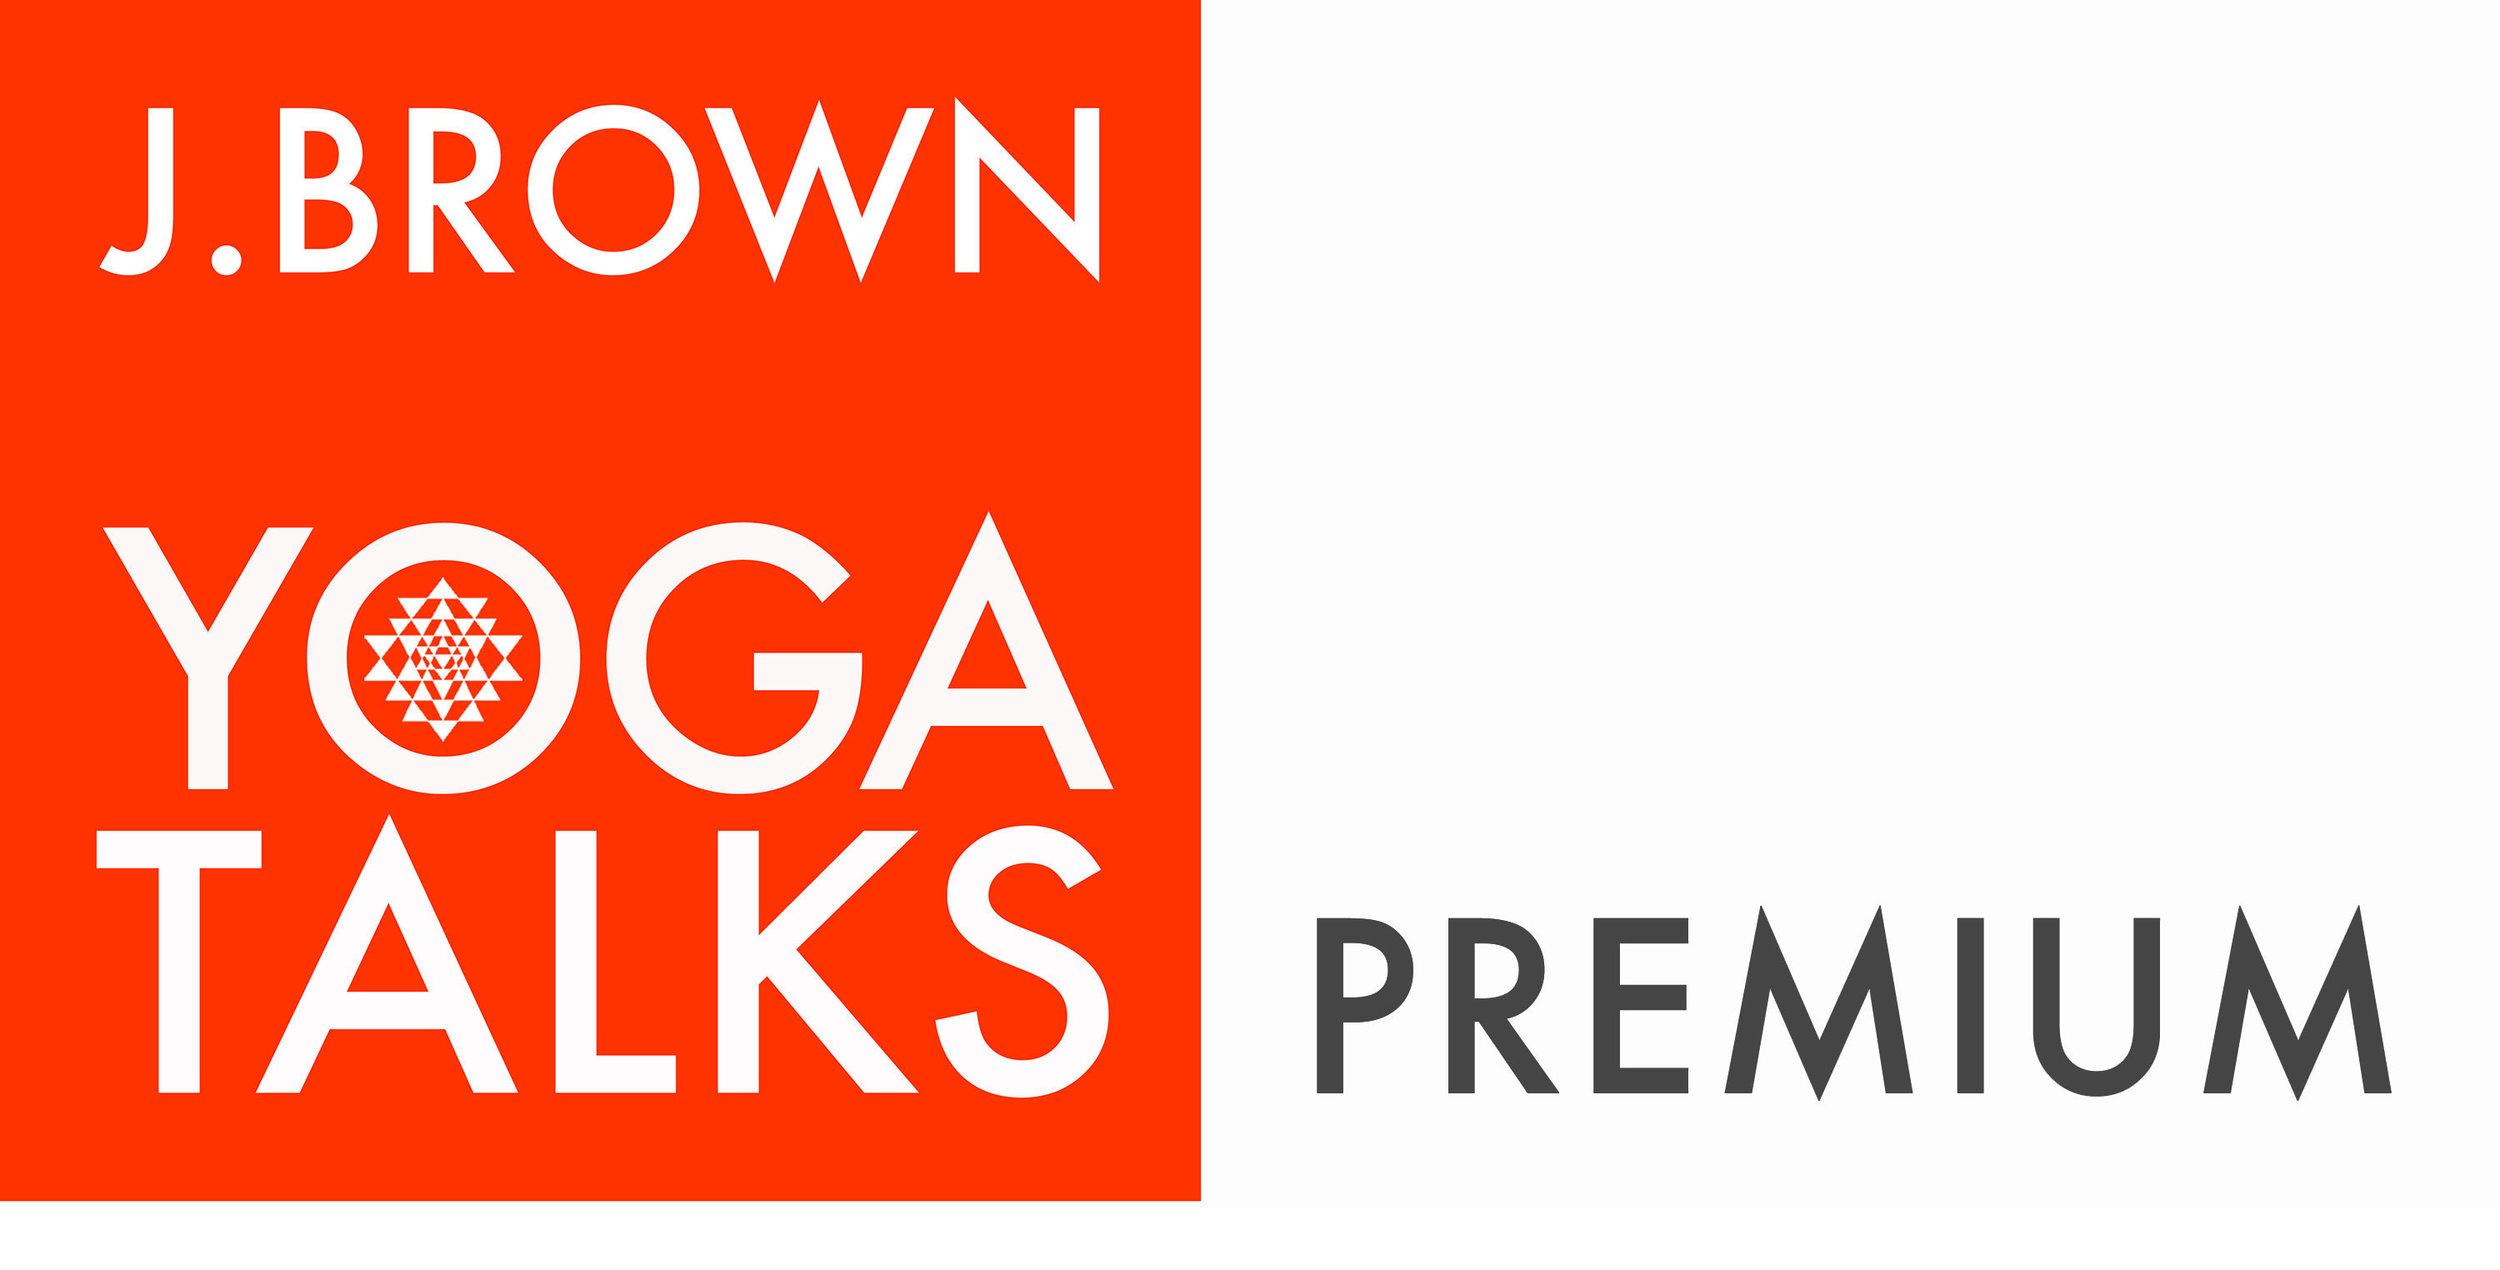 jbrownyogatalks_Premium_Home.jpg